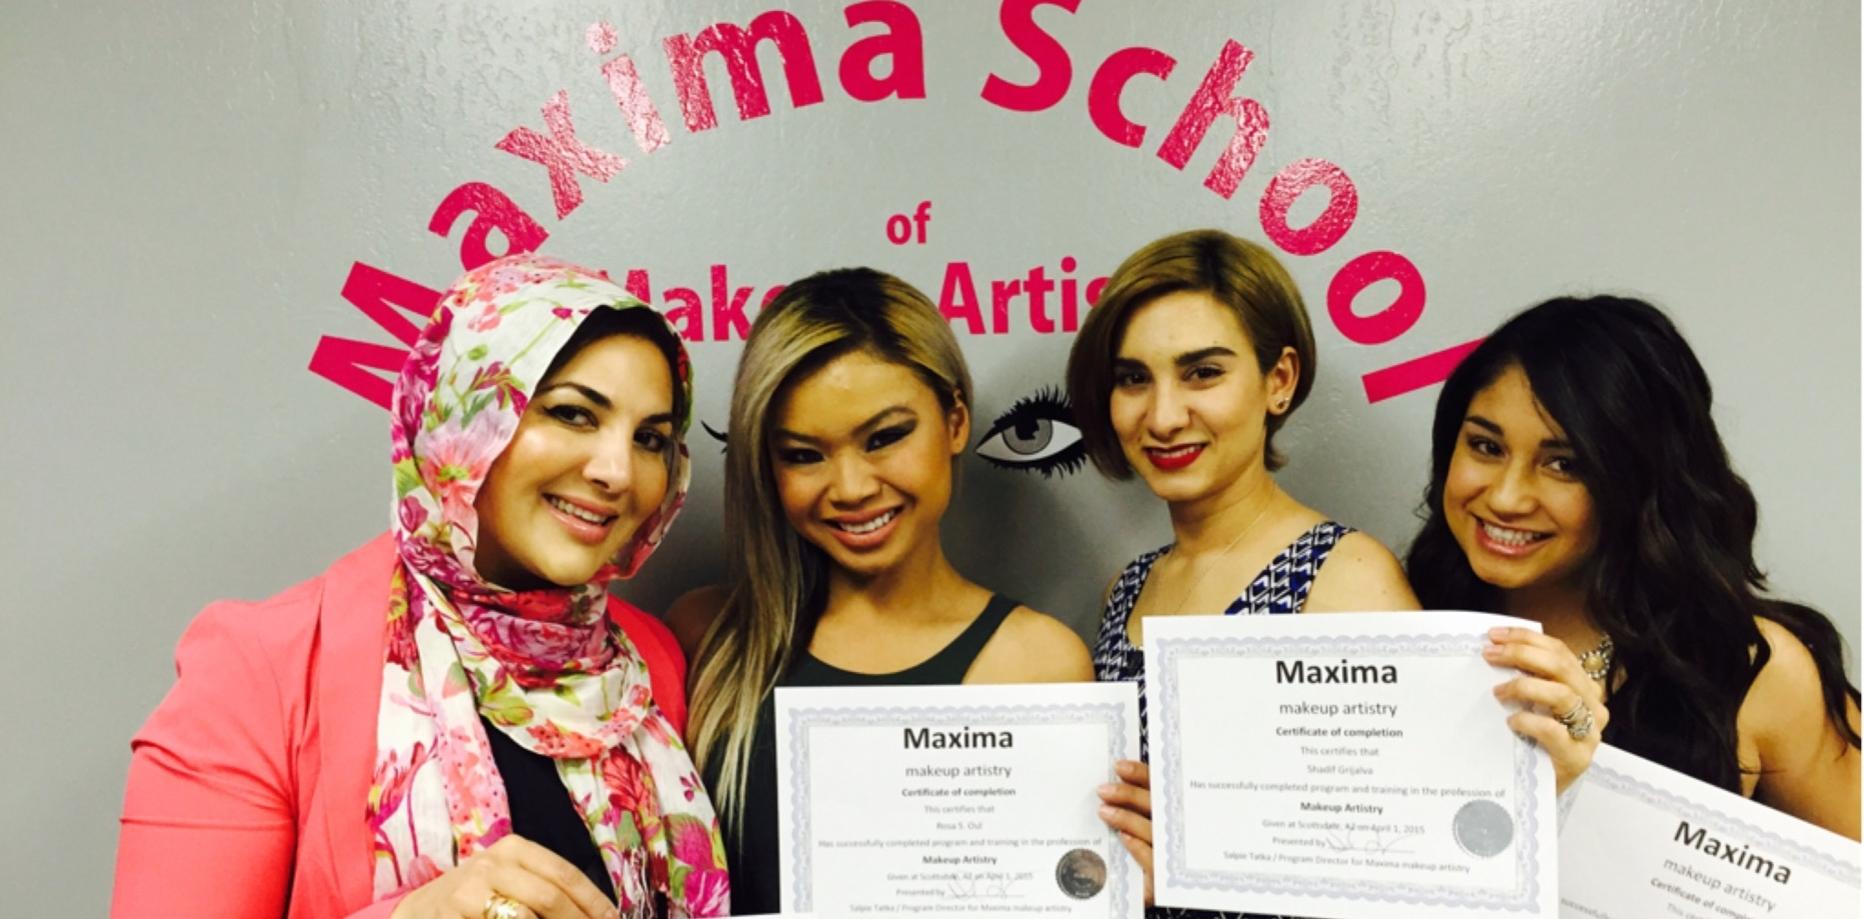 Maxima School Of Makeup Artistry